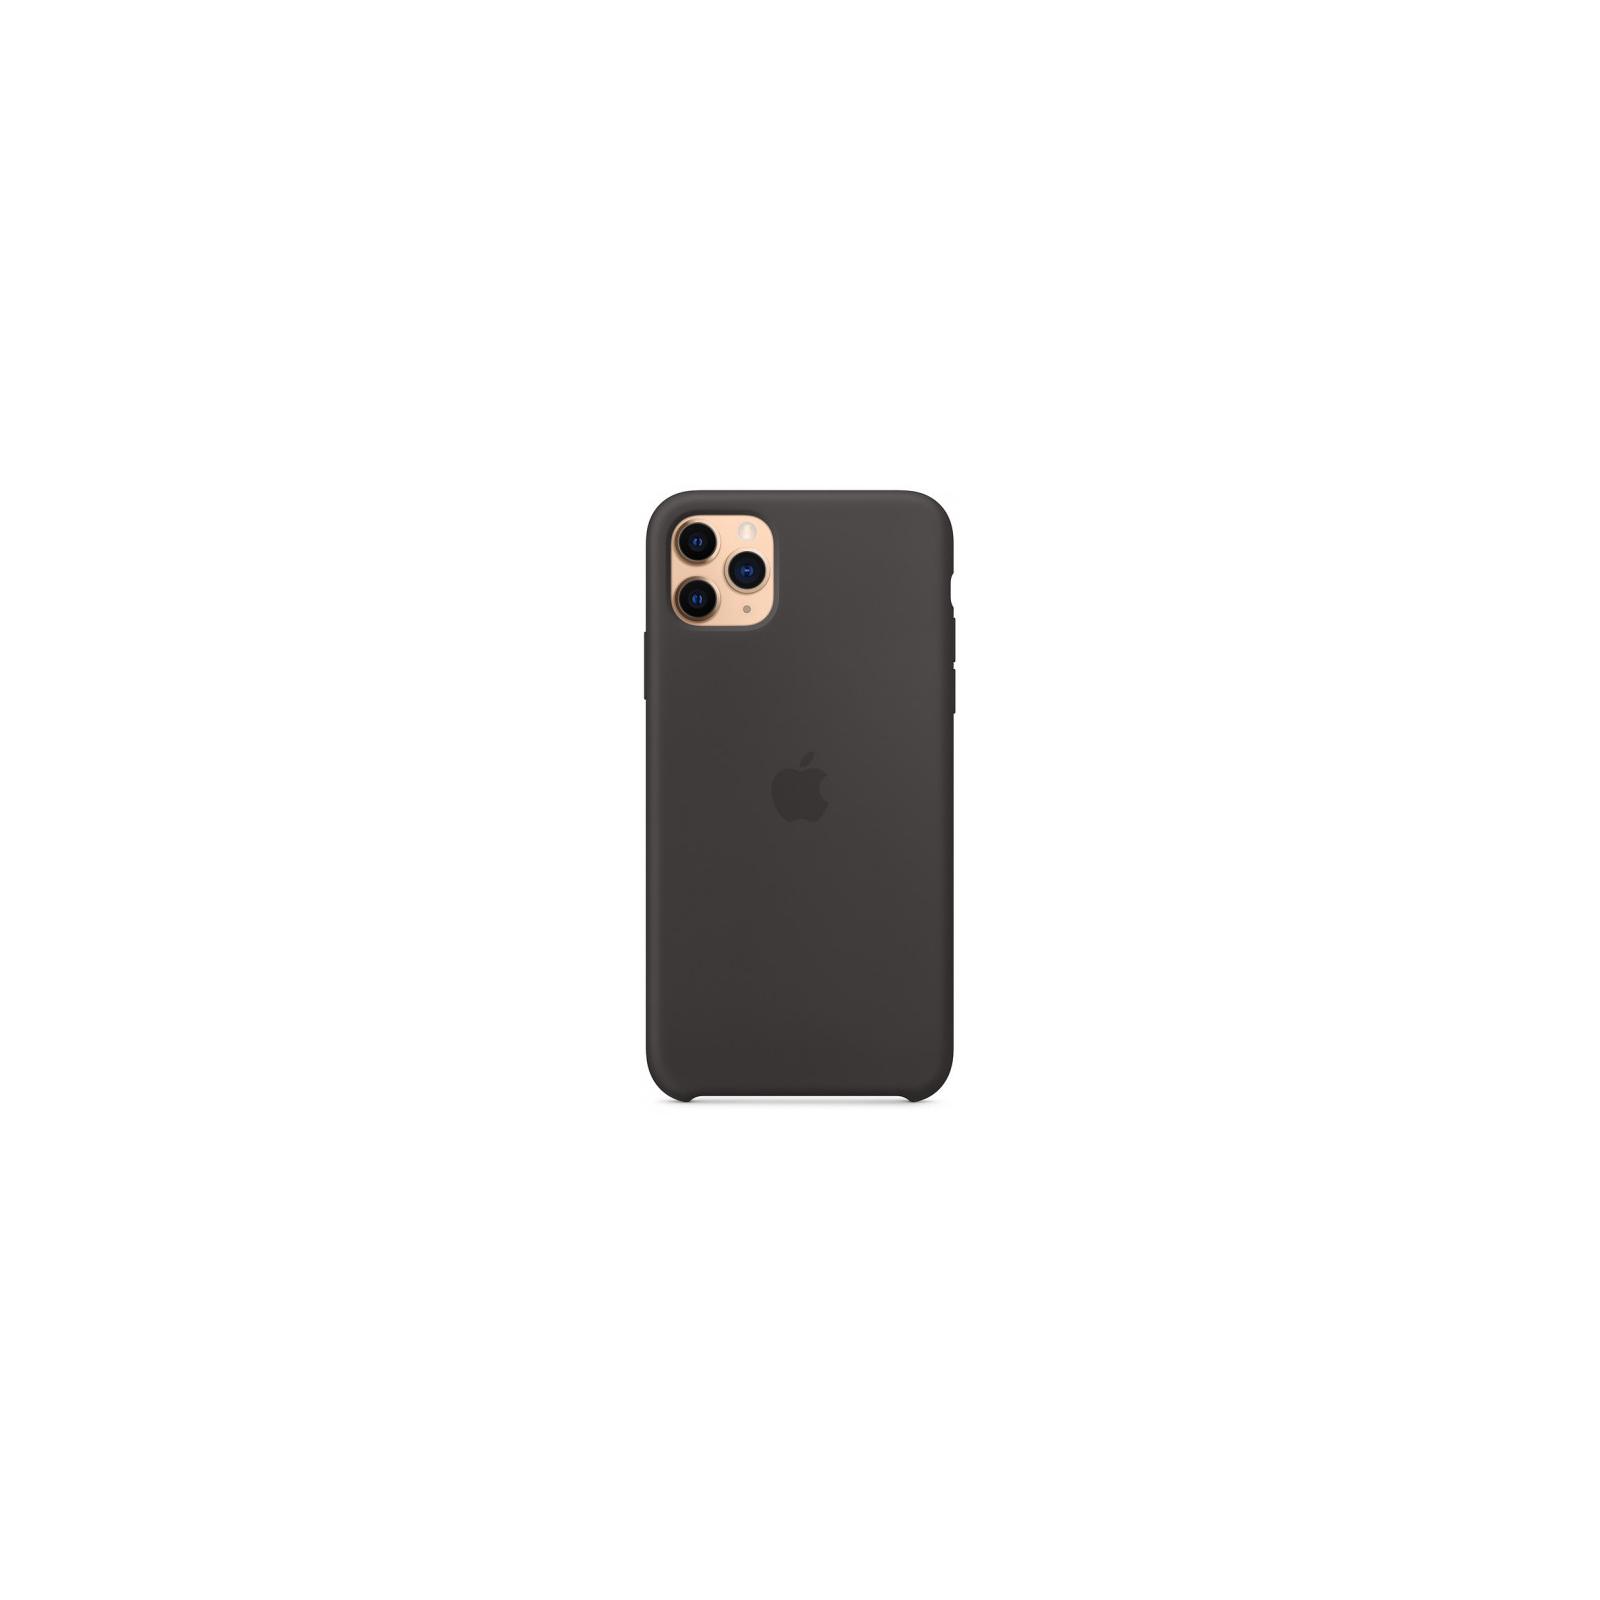 Чехол для моб. телефона Apple iPhone 11 Pro Max Silicone Case - Pine Green (MX012ZM/A) изображение 4